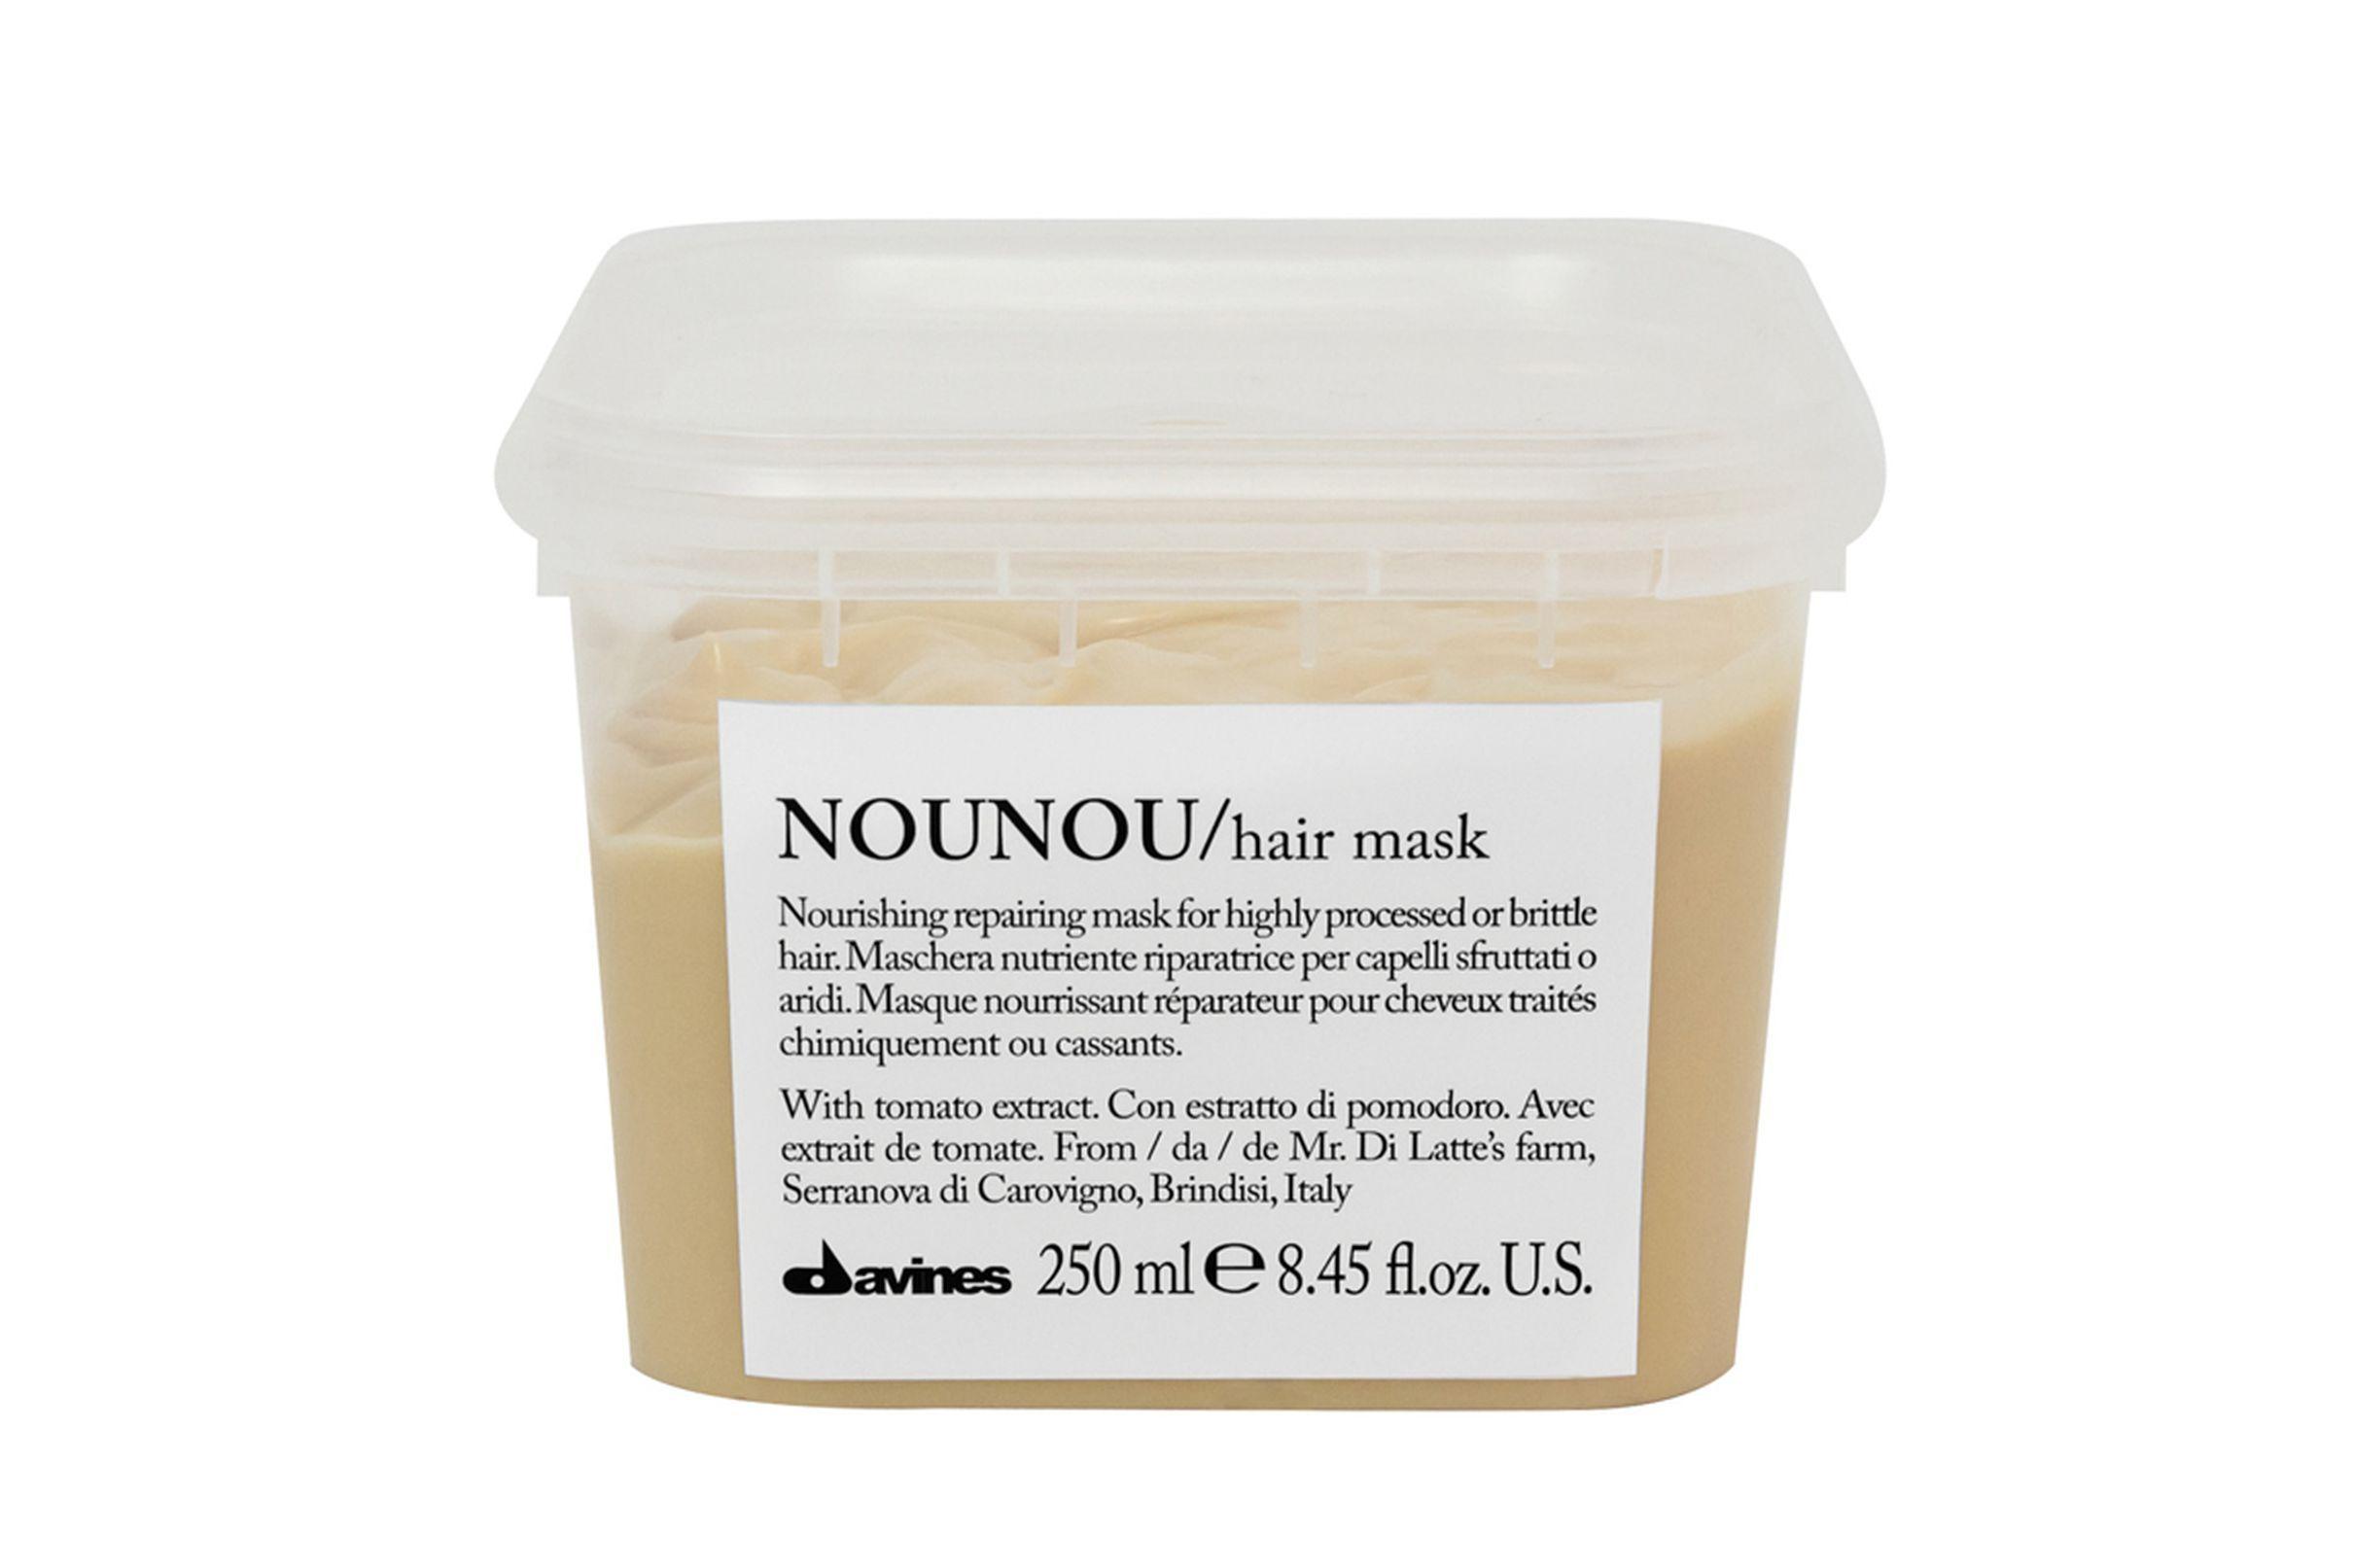 Davines Nounou Repairing Mask Is Like a Fancy Salon Treatment in a Jar - Racked